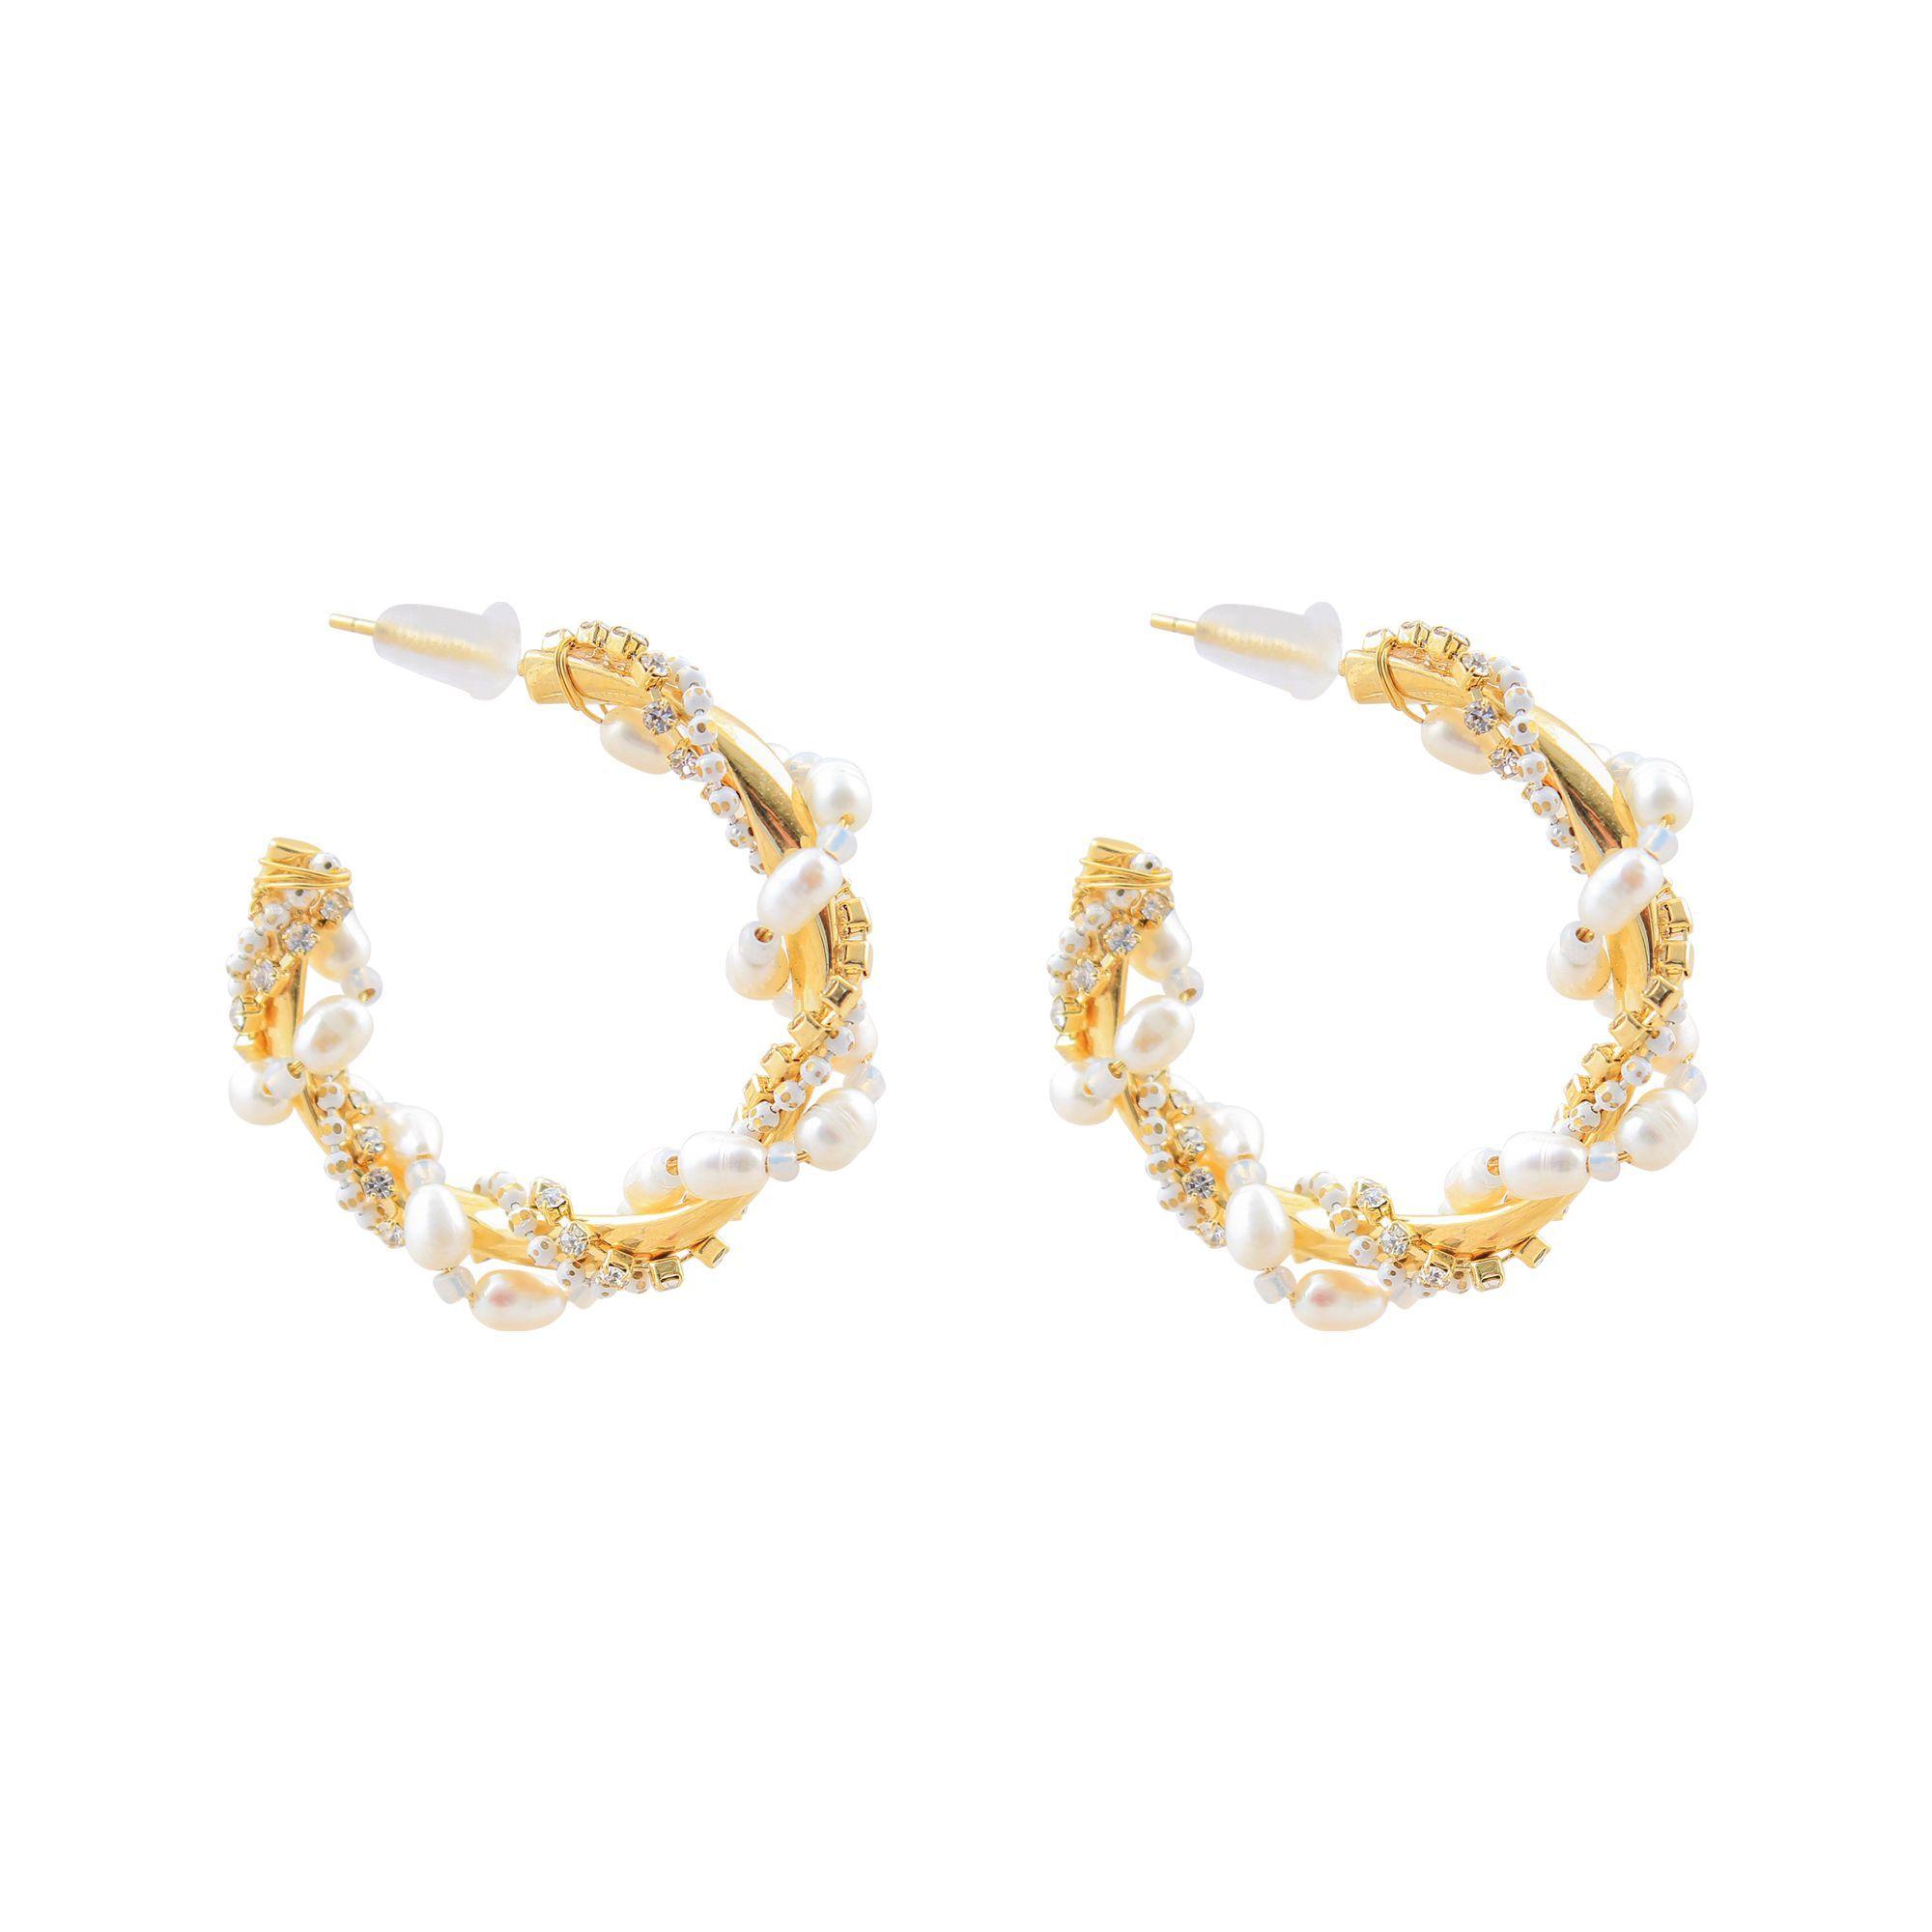 Pearl Bali Girls Earrings Ns 0136